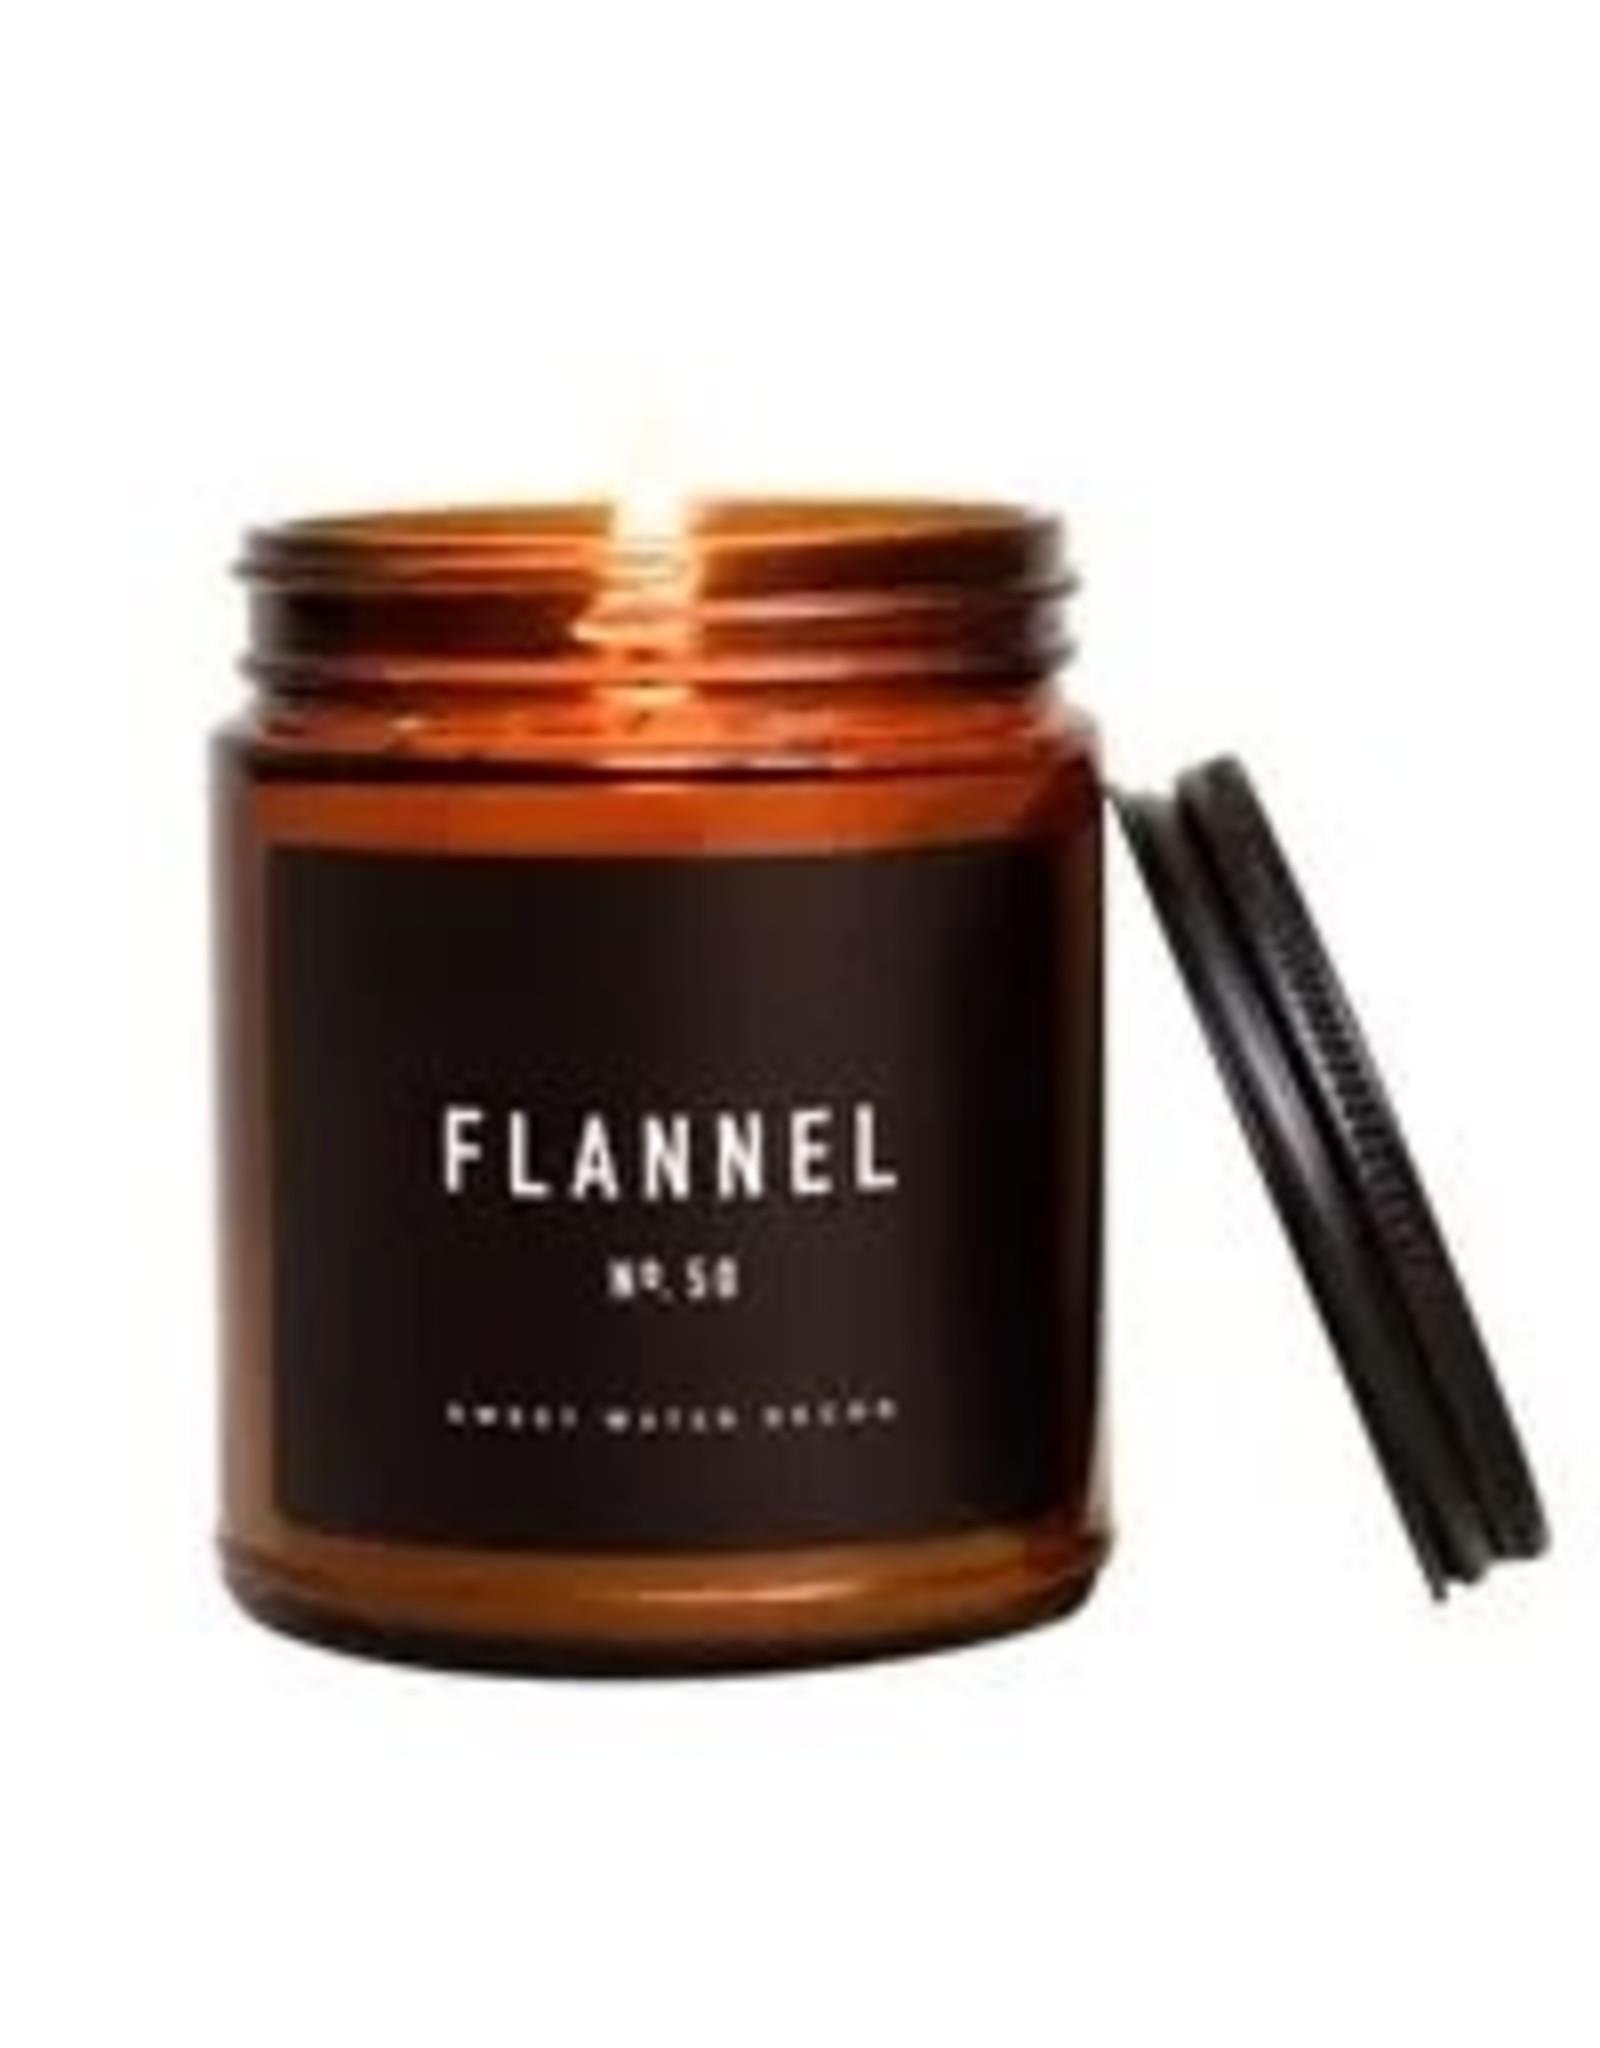 The Florist & The Merchant Flannel Home Fragrance